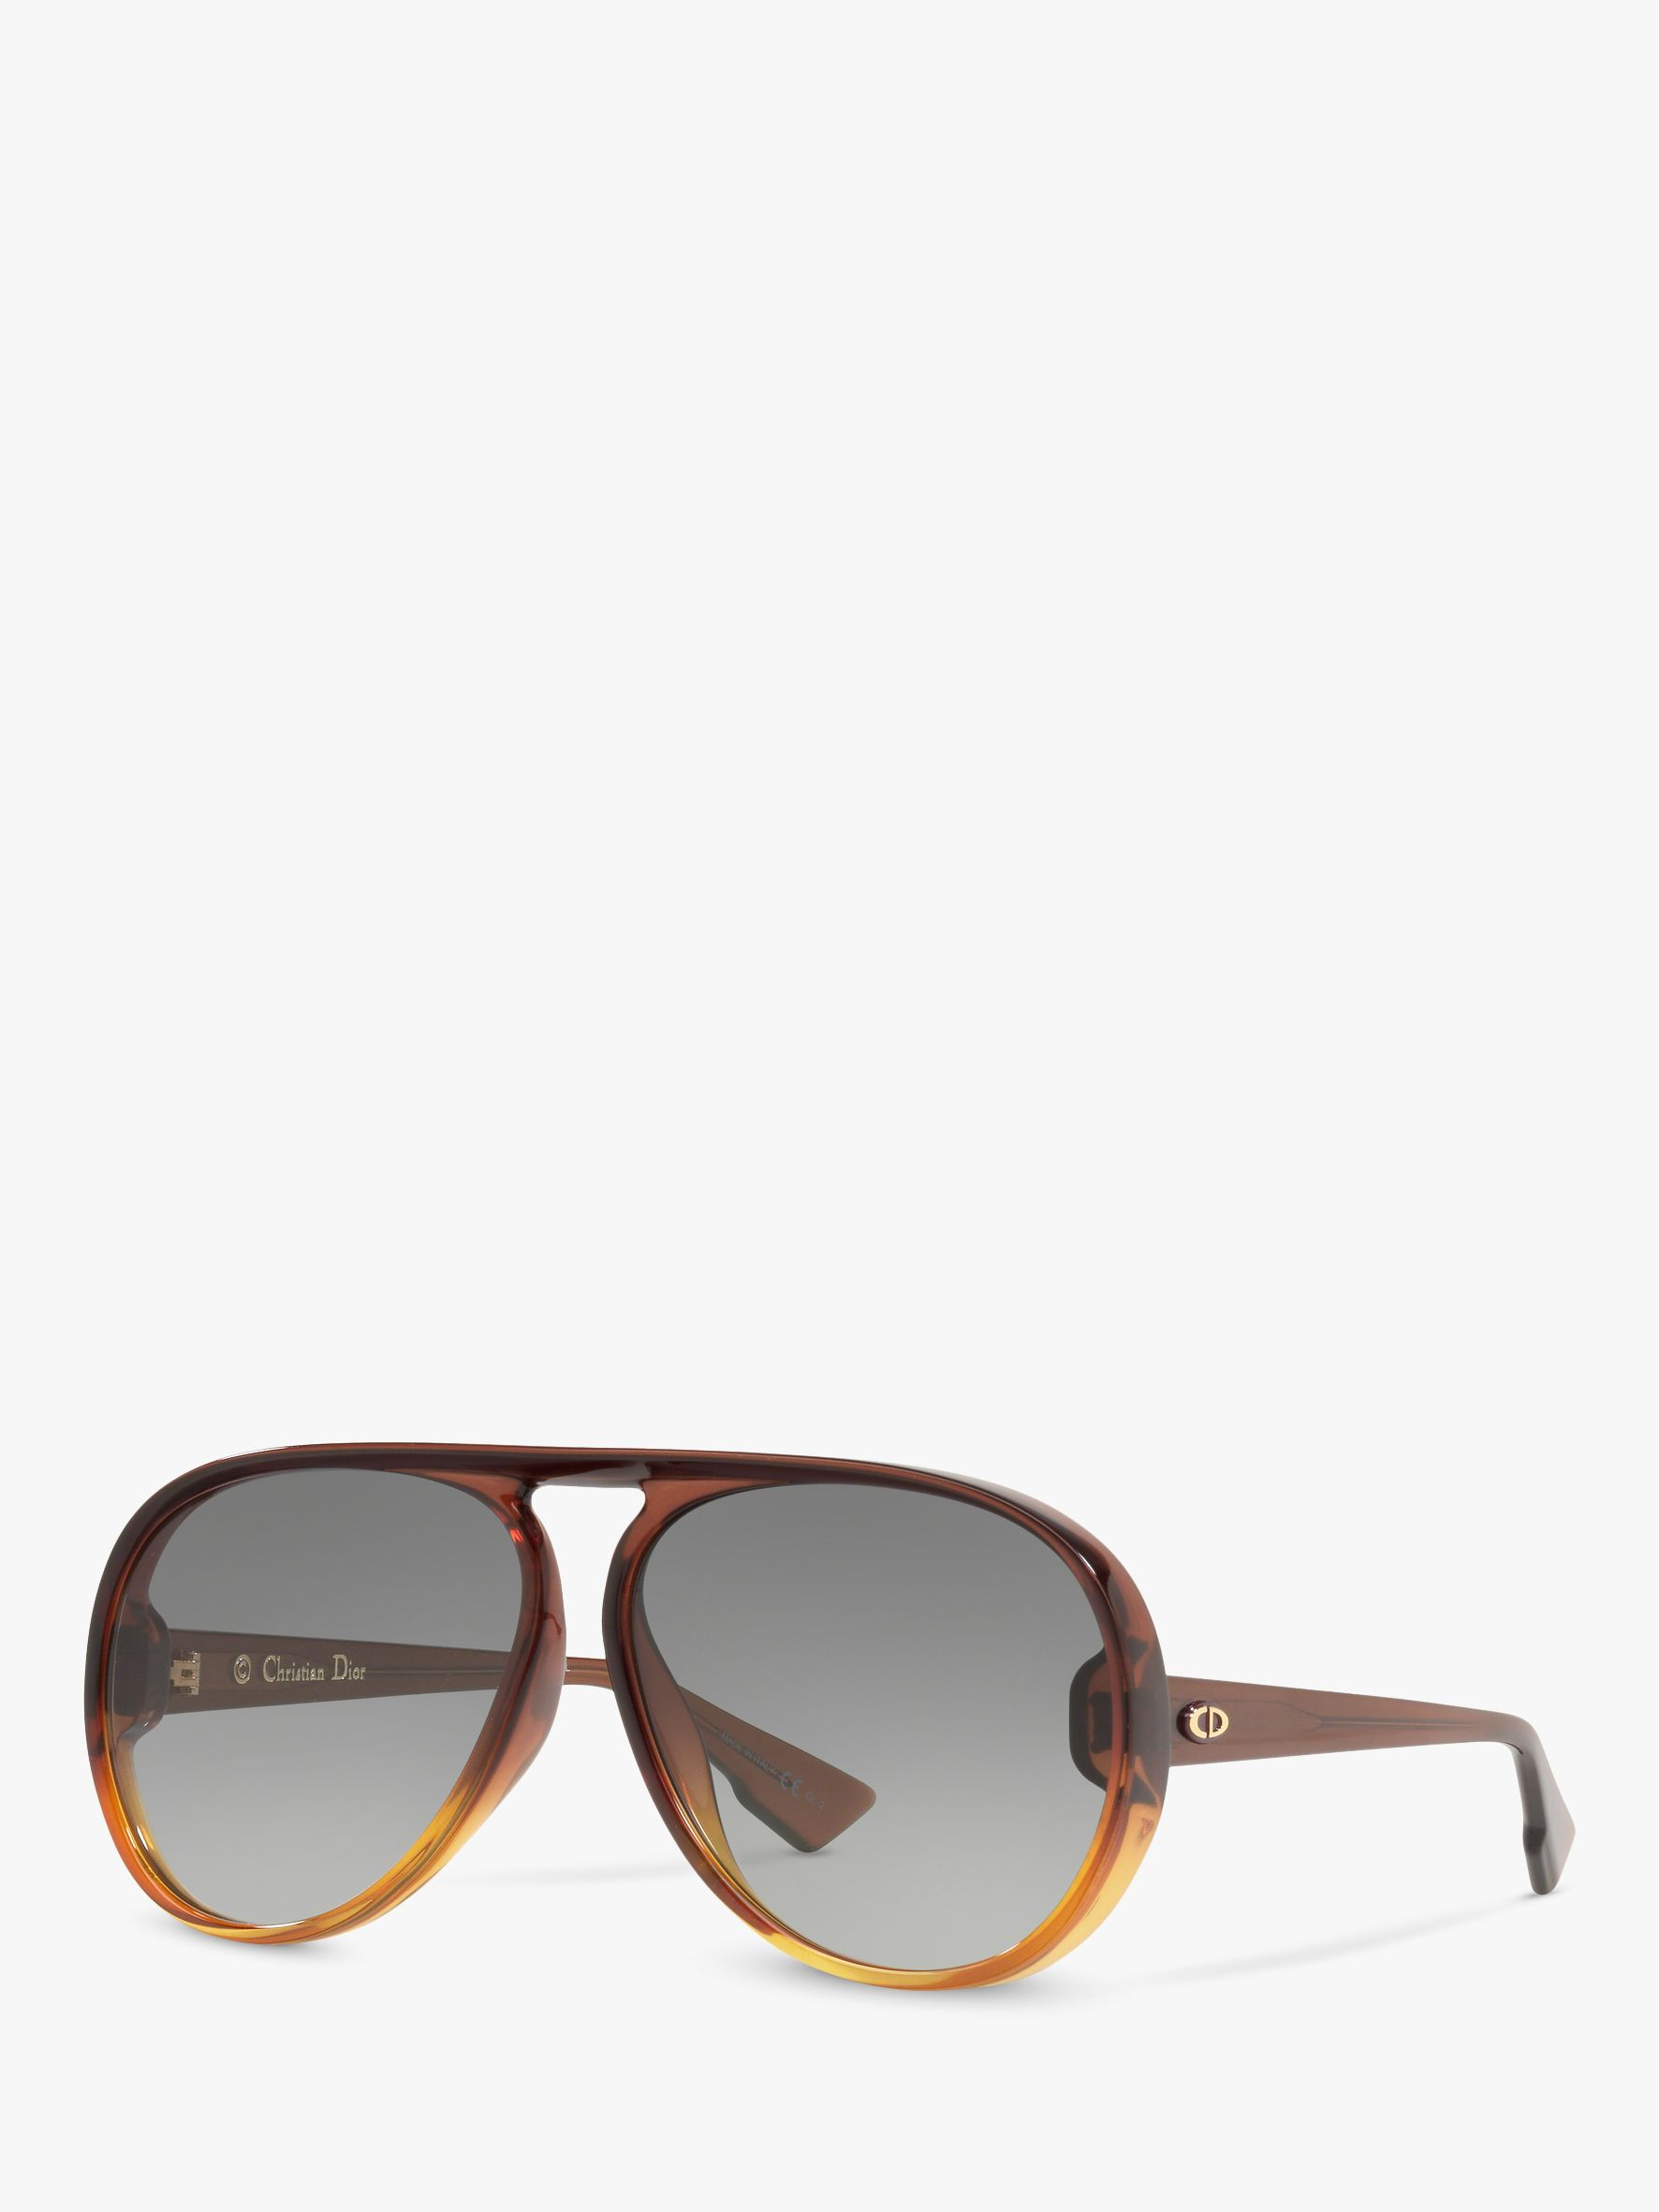 2b65b2296b05 Dior Diorlia Women's Aviator Sunglasses, Tortoise Brown/Grey at John Lewis  & Partners